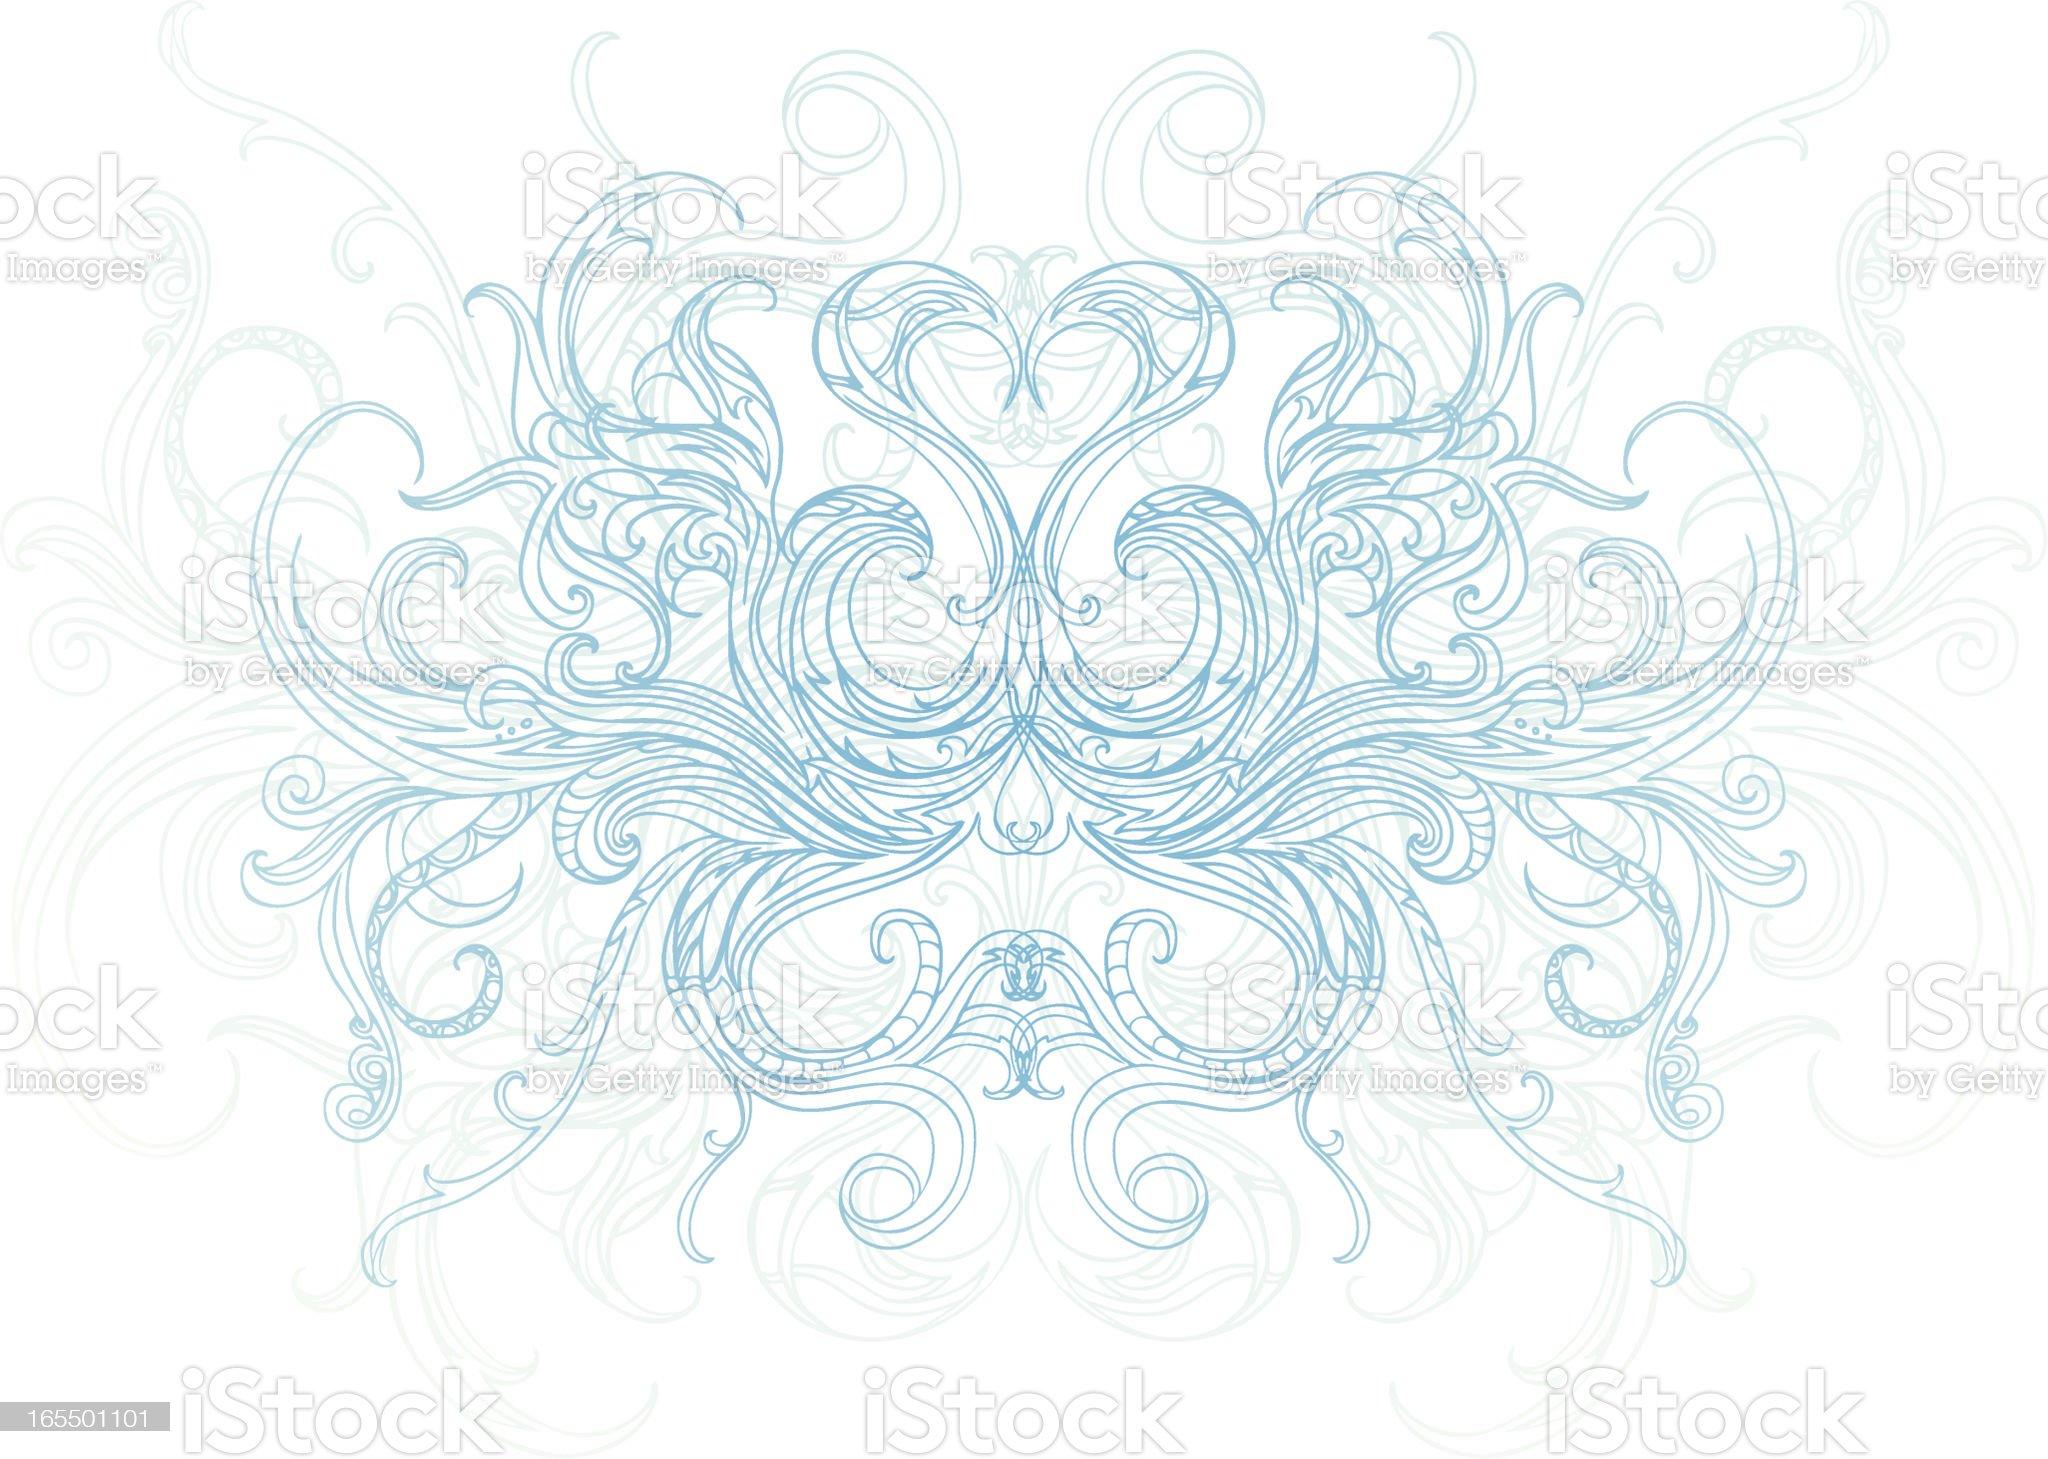 water spirit royalty-free stock vector art